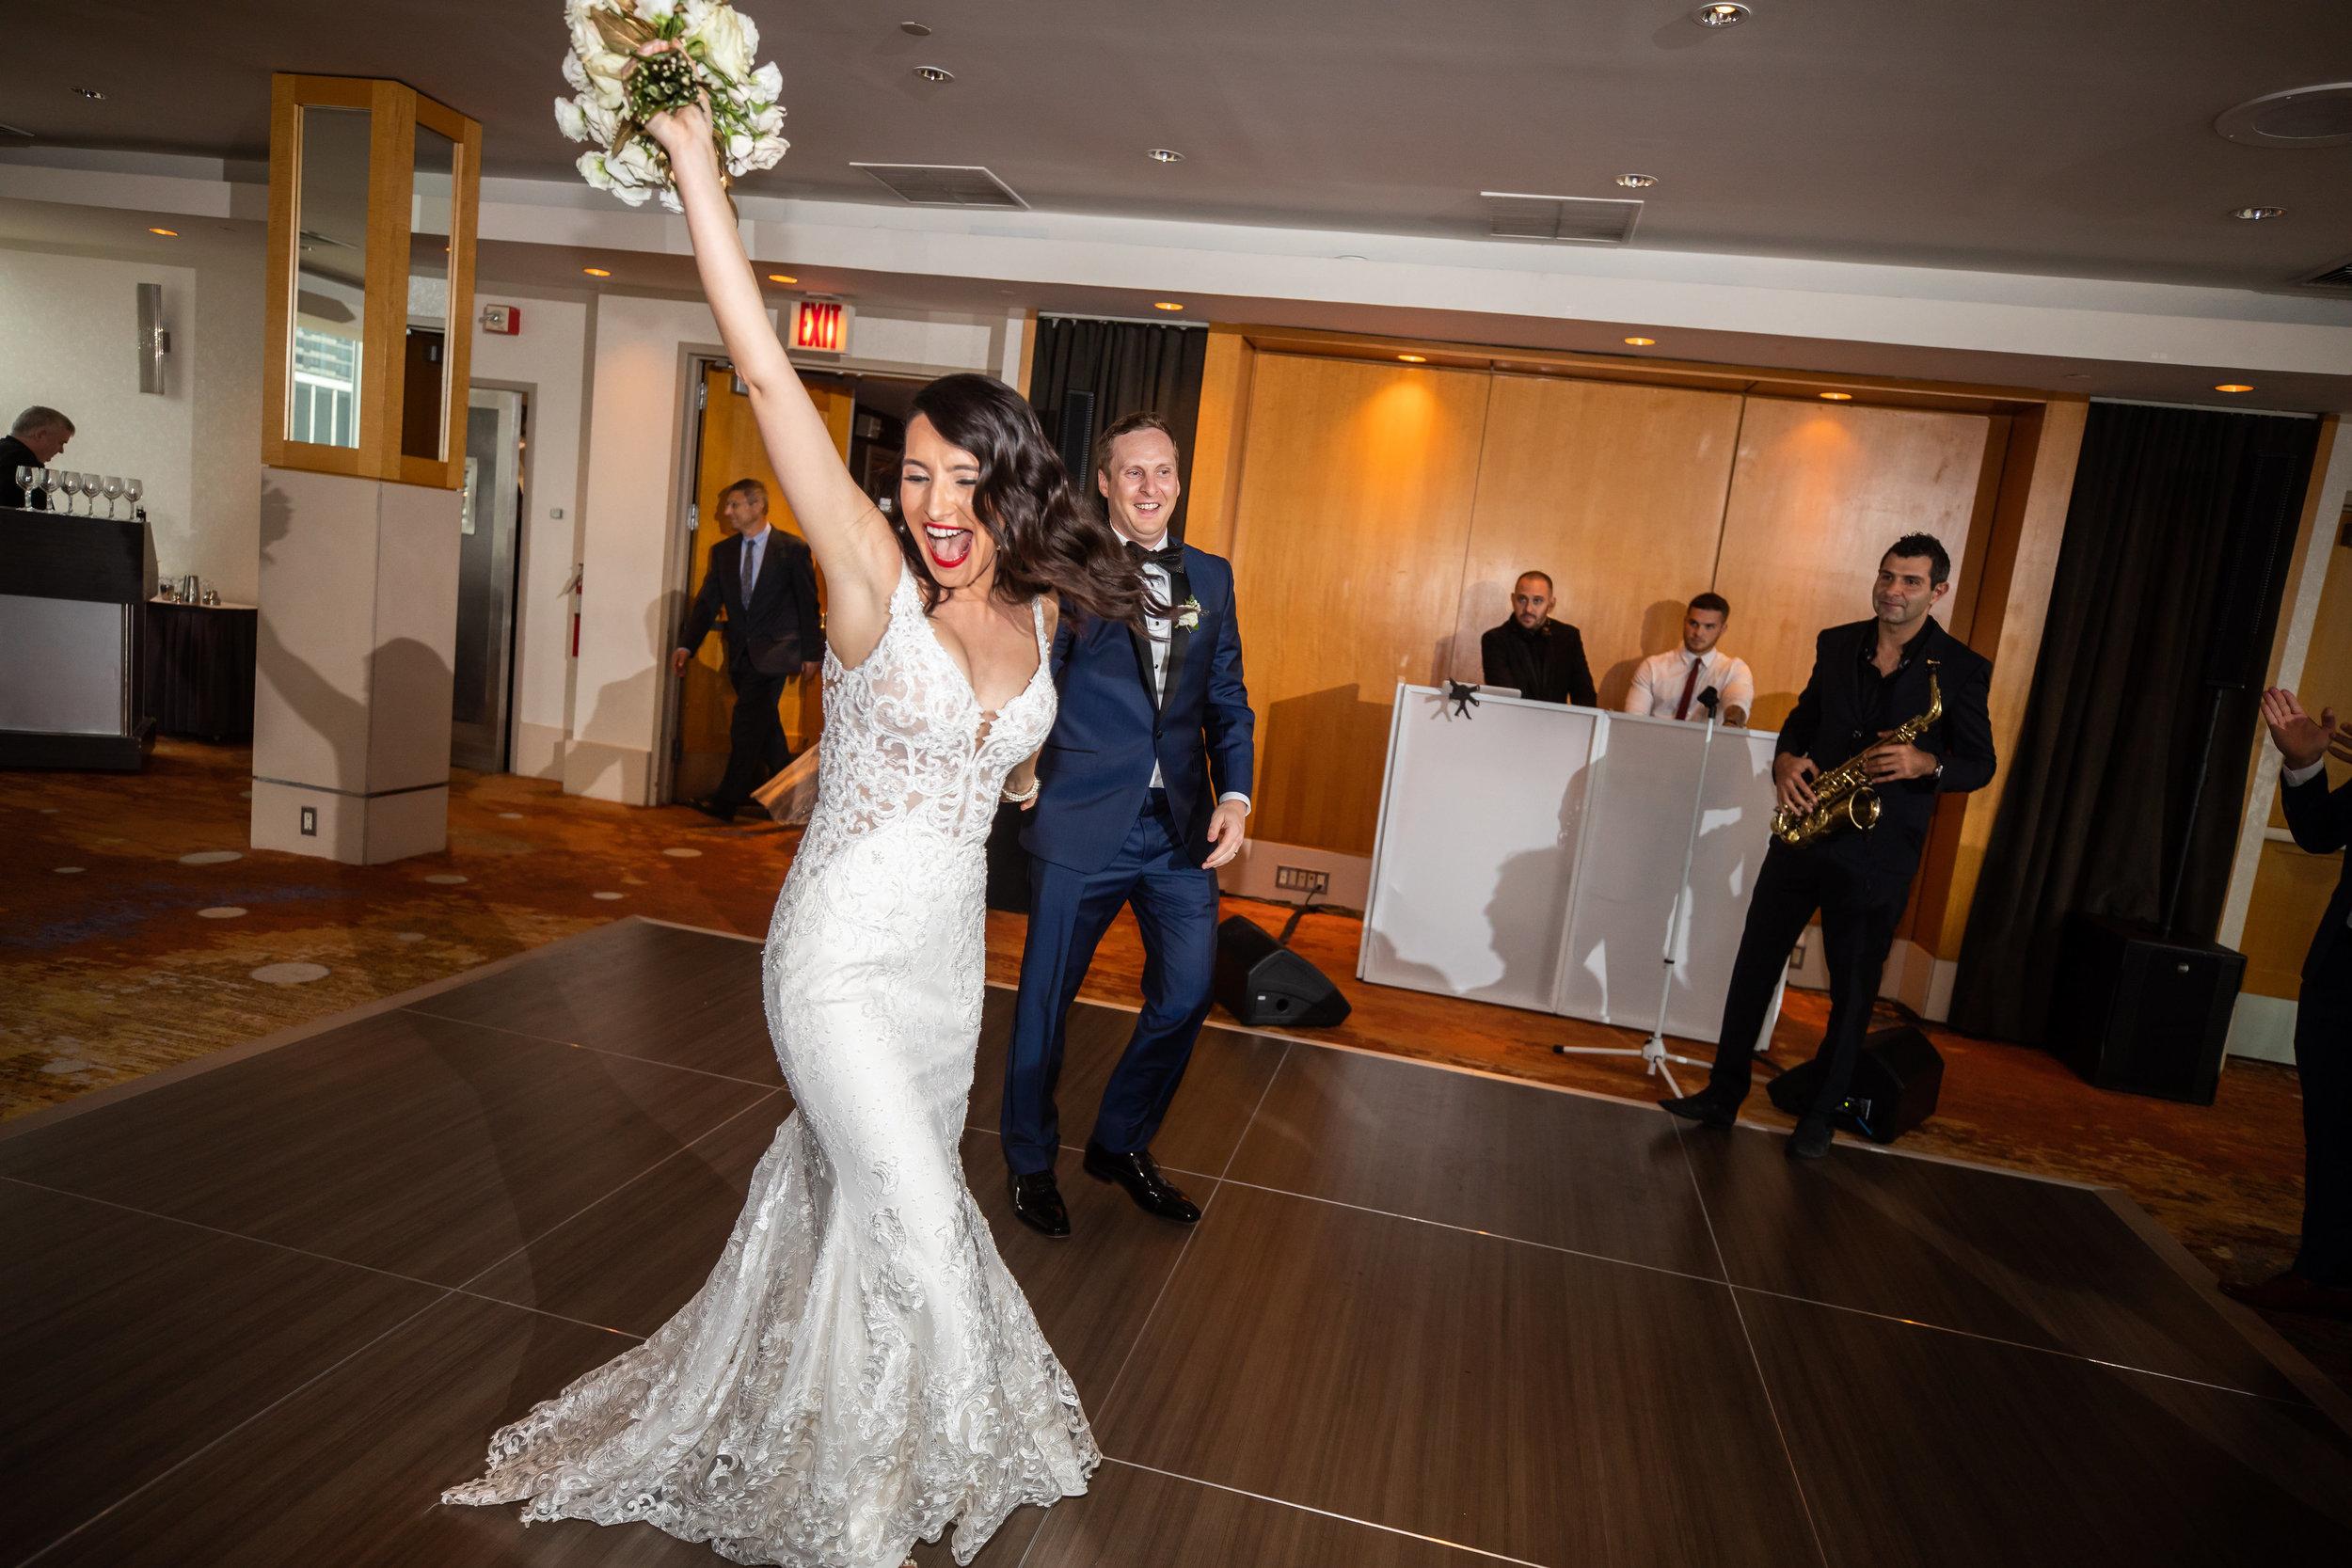 Alex-Edge-DJ-Wedding-Entertainment-Parker-New-York_10.JPG